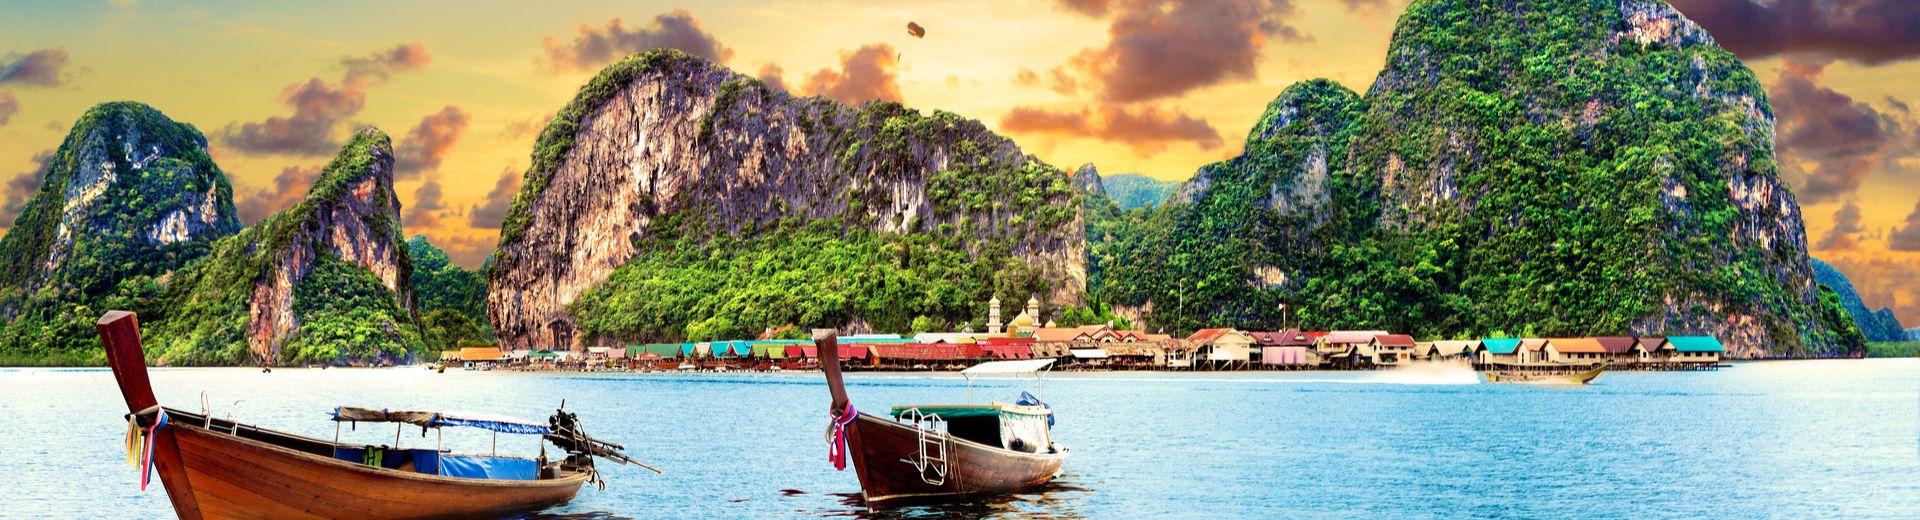 Kombireise: Bangkok & Inselhopping in Süd-Thailand